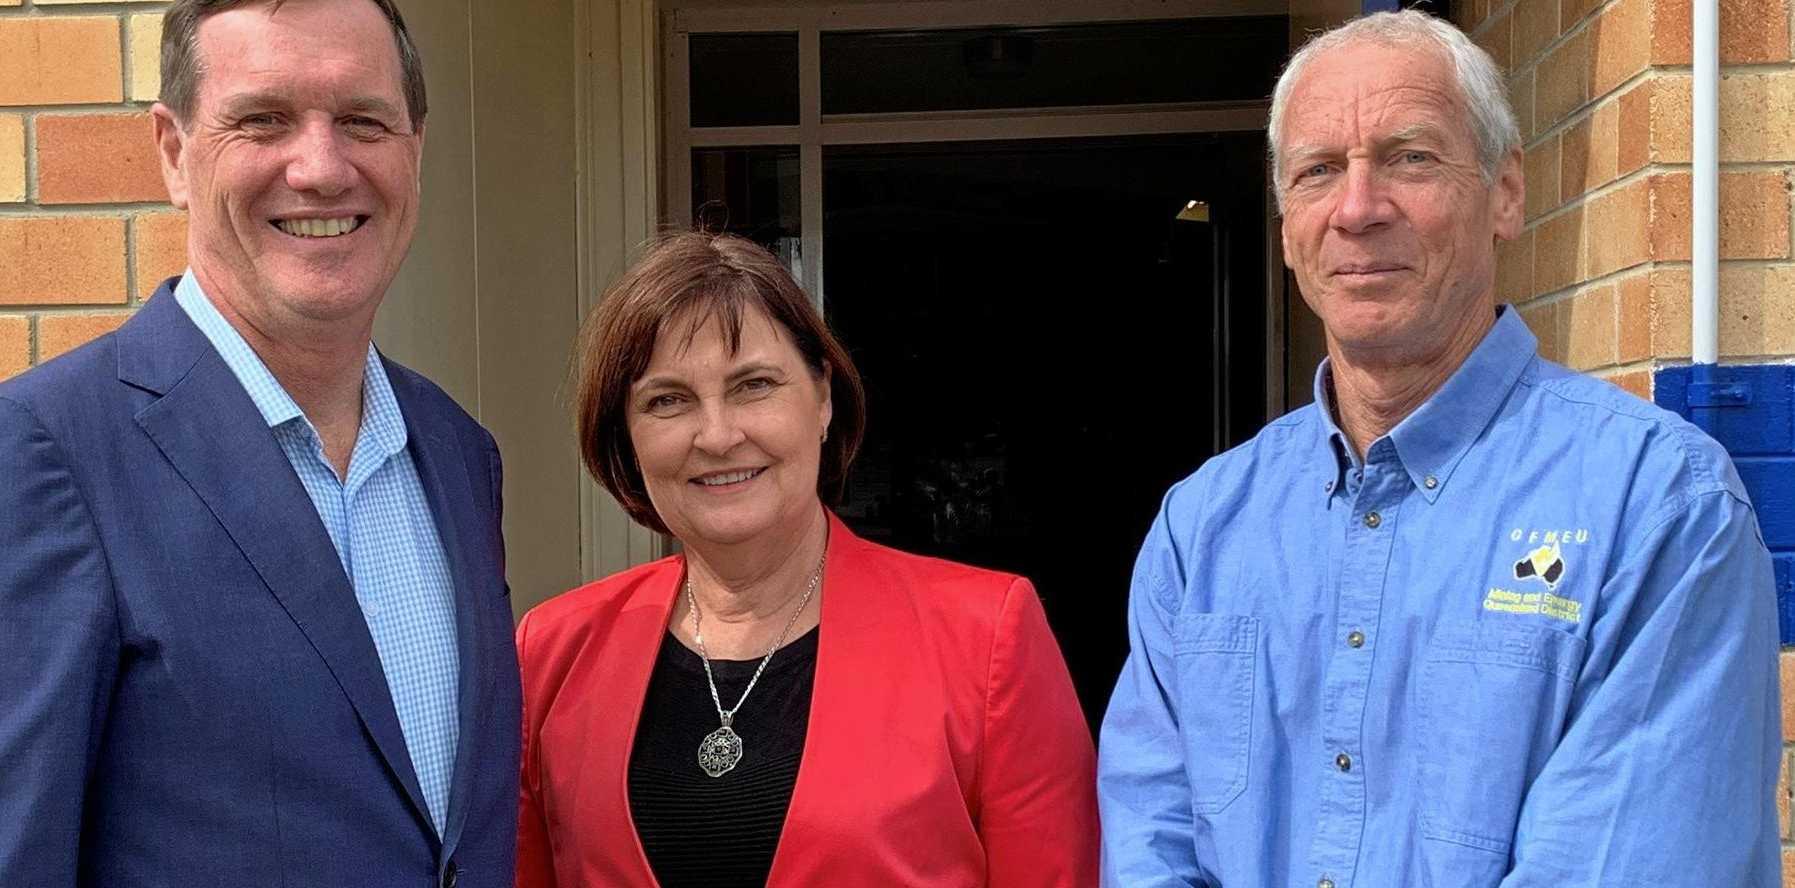 Queensland Mines Minister Anthony Lynham, Mackay MP Julieanne Gilbert and CFMEU district vice president Steve Pierce.